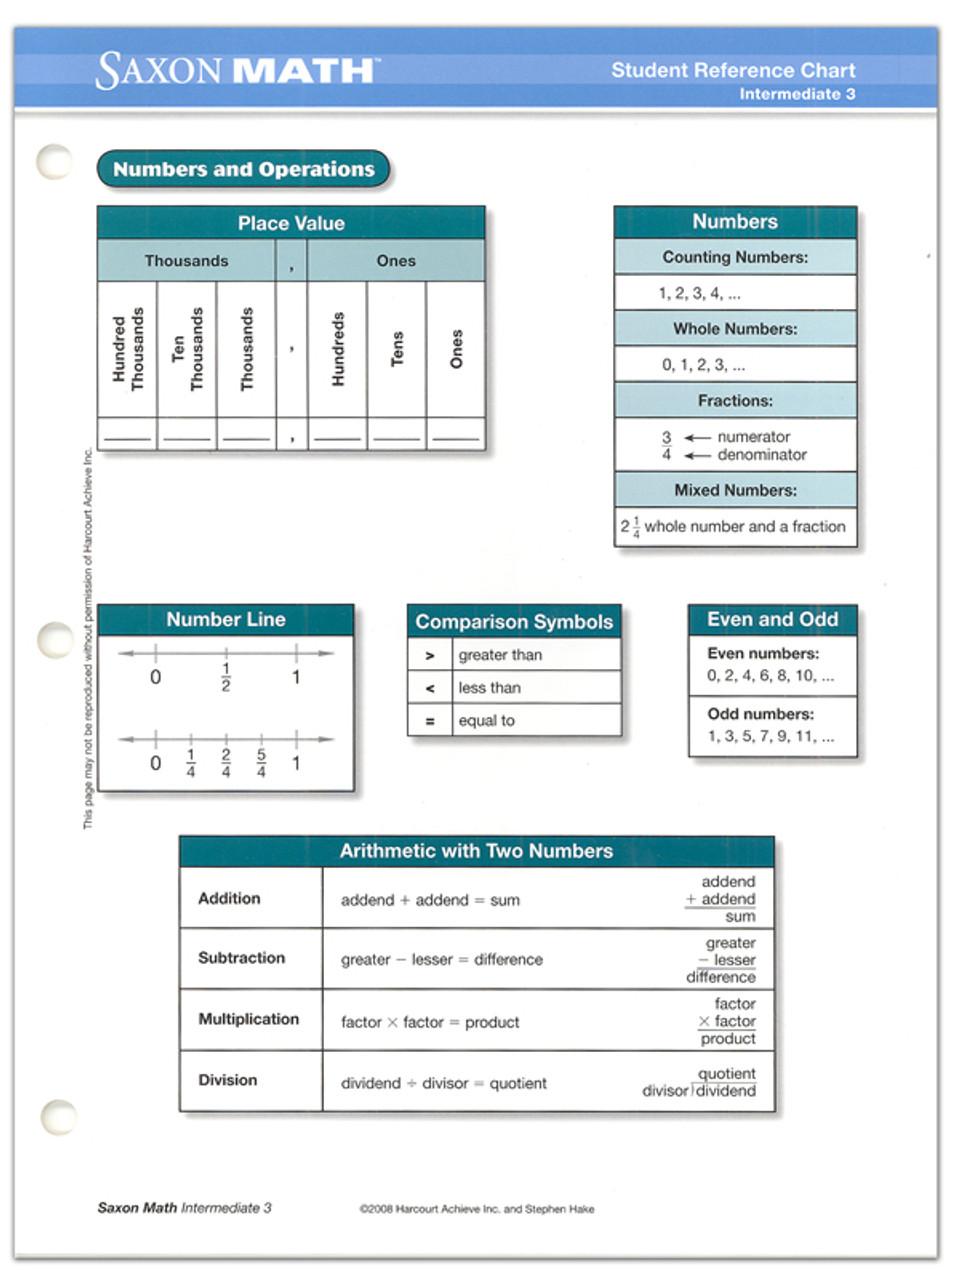 Saxon Math Grade 3 Intermediate Student Reference Chart - Classroom  Resource Center [ 1280 x 960 Pixel ]